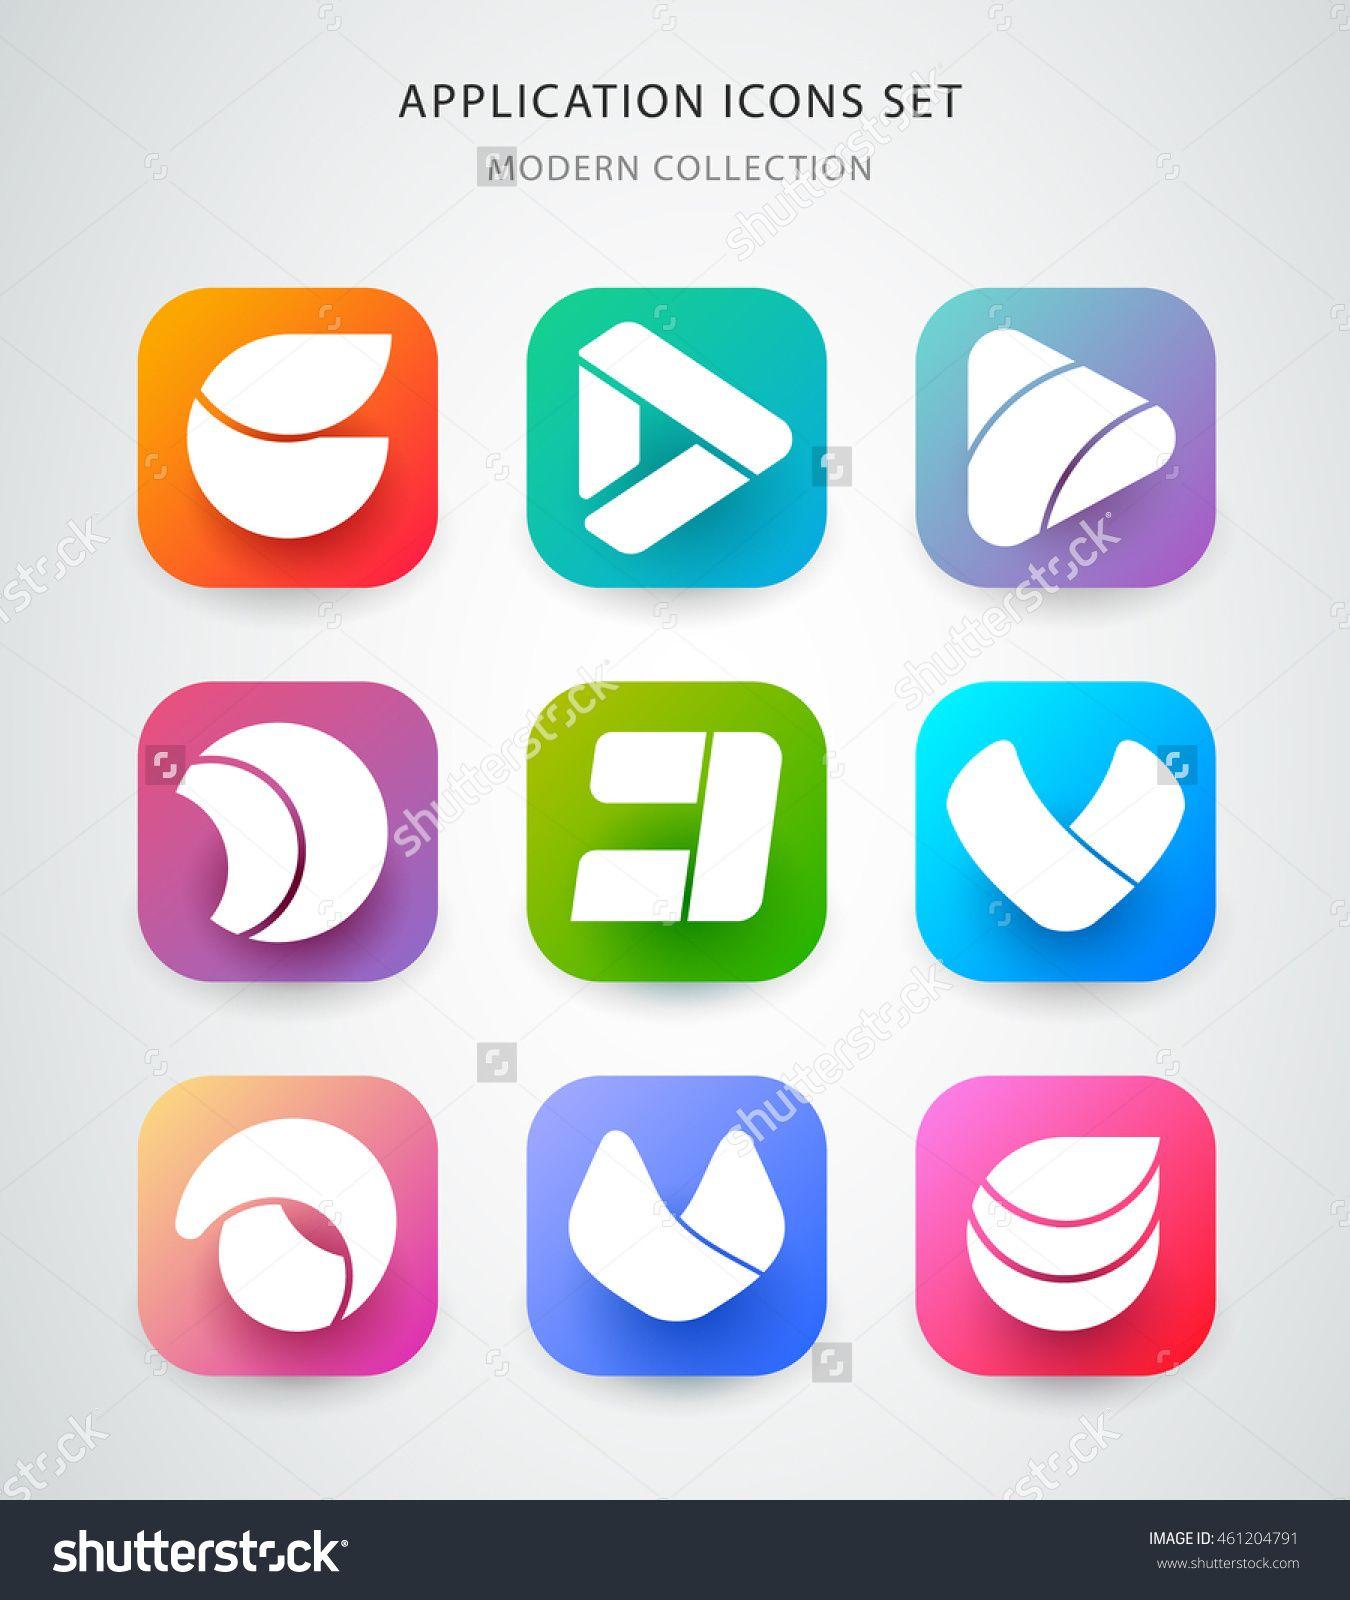 Big vector icons set for application logo icon design. App ...